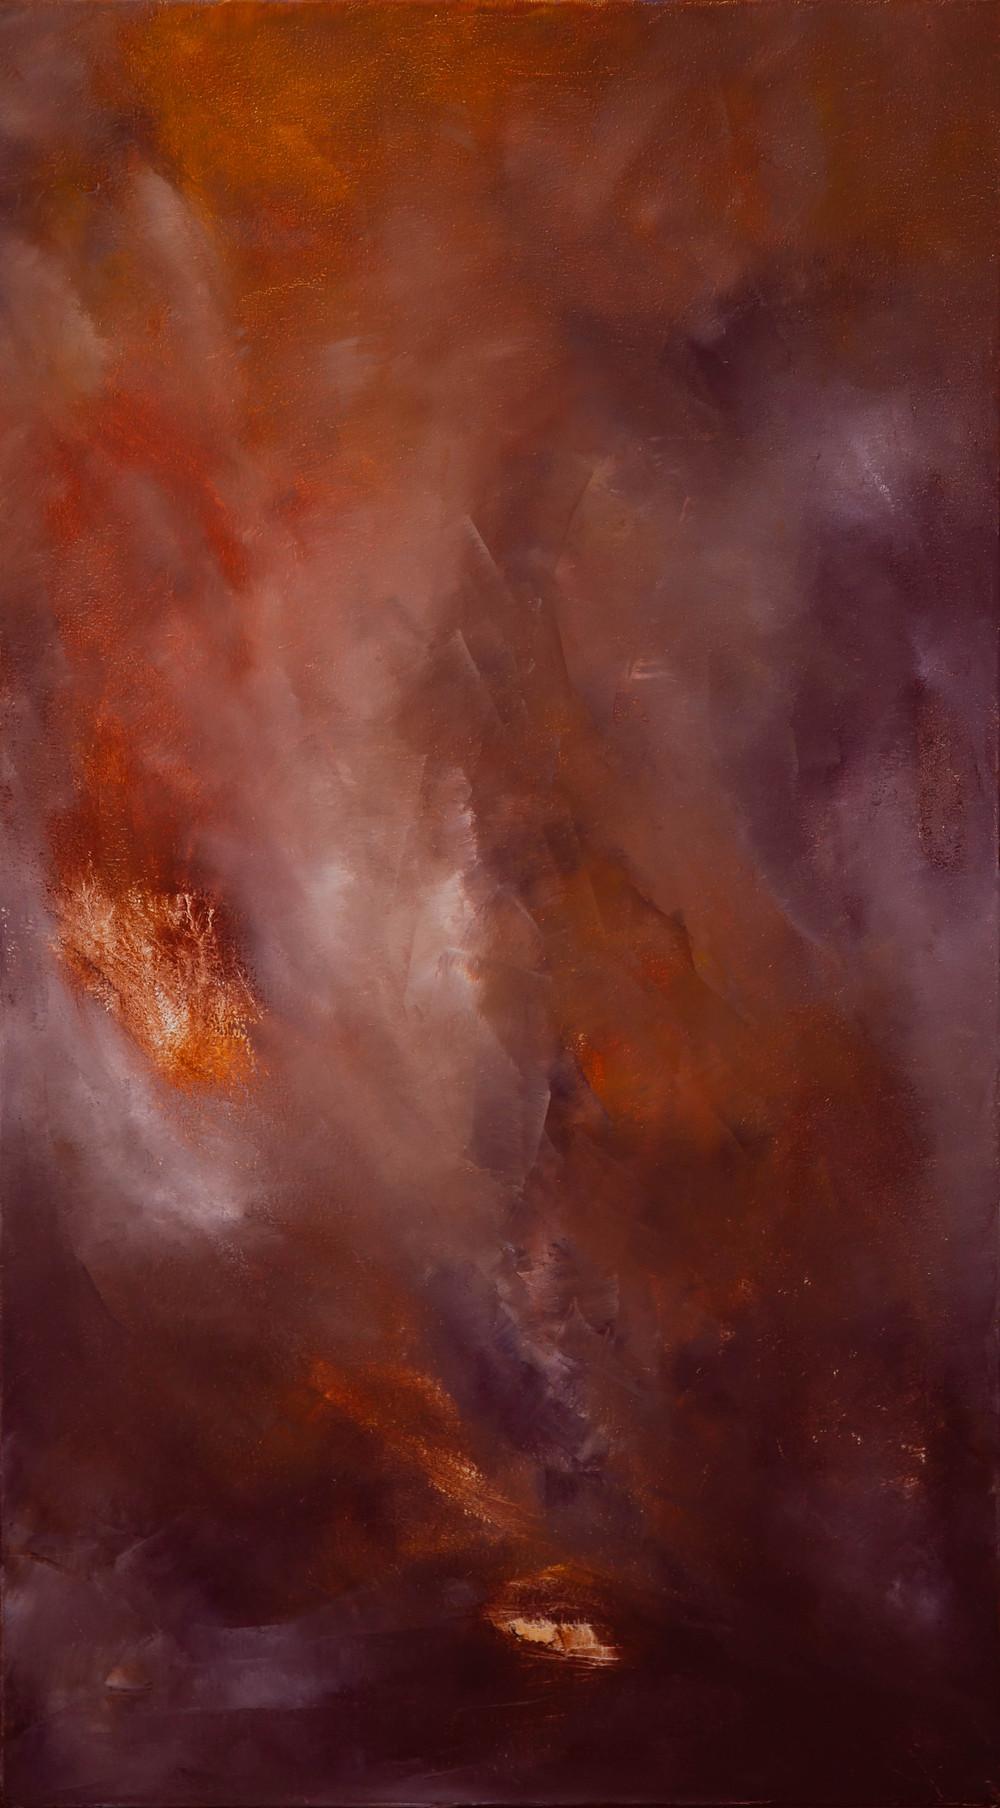 Surviving Loving Environment, Oil on Canvas